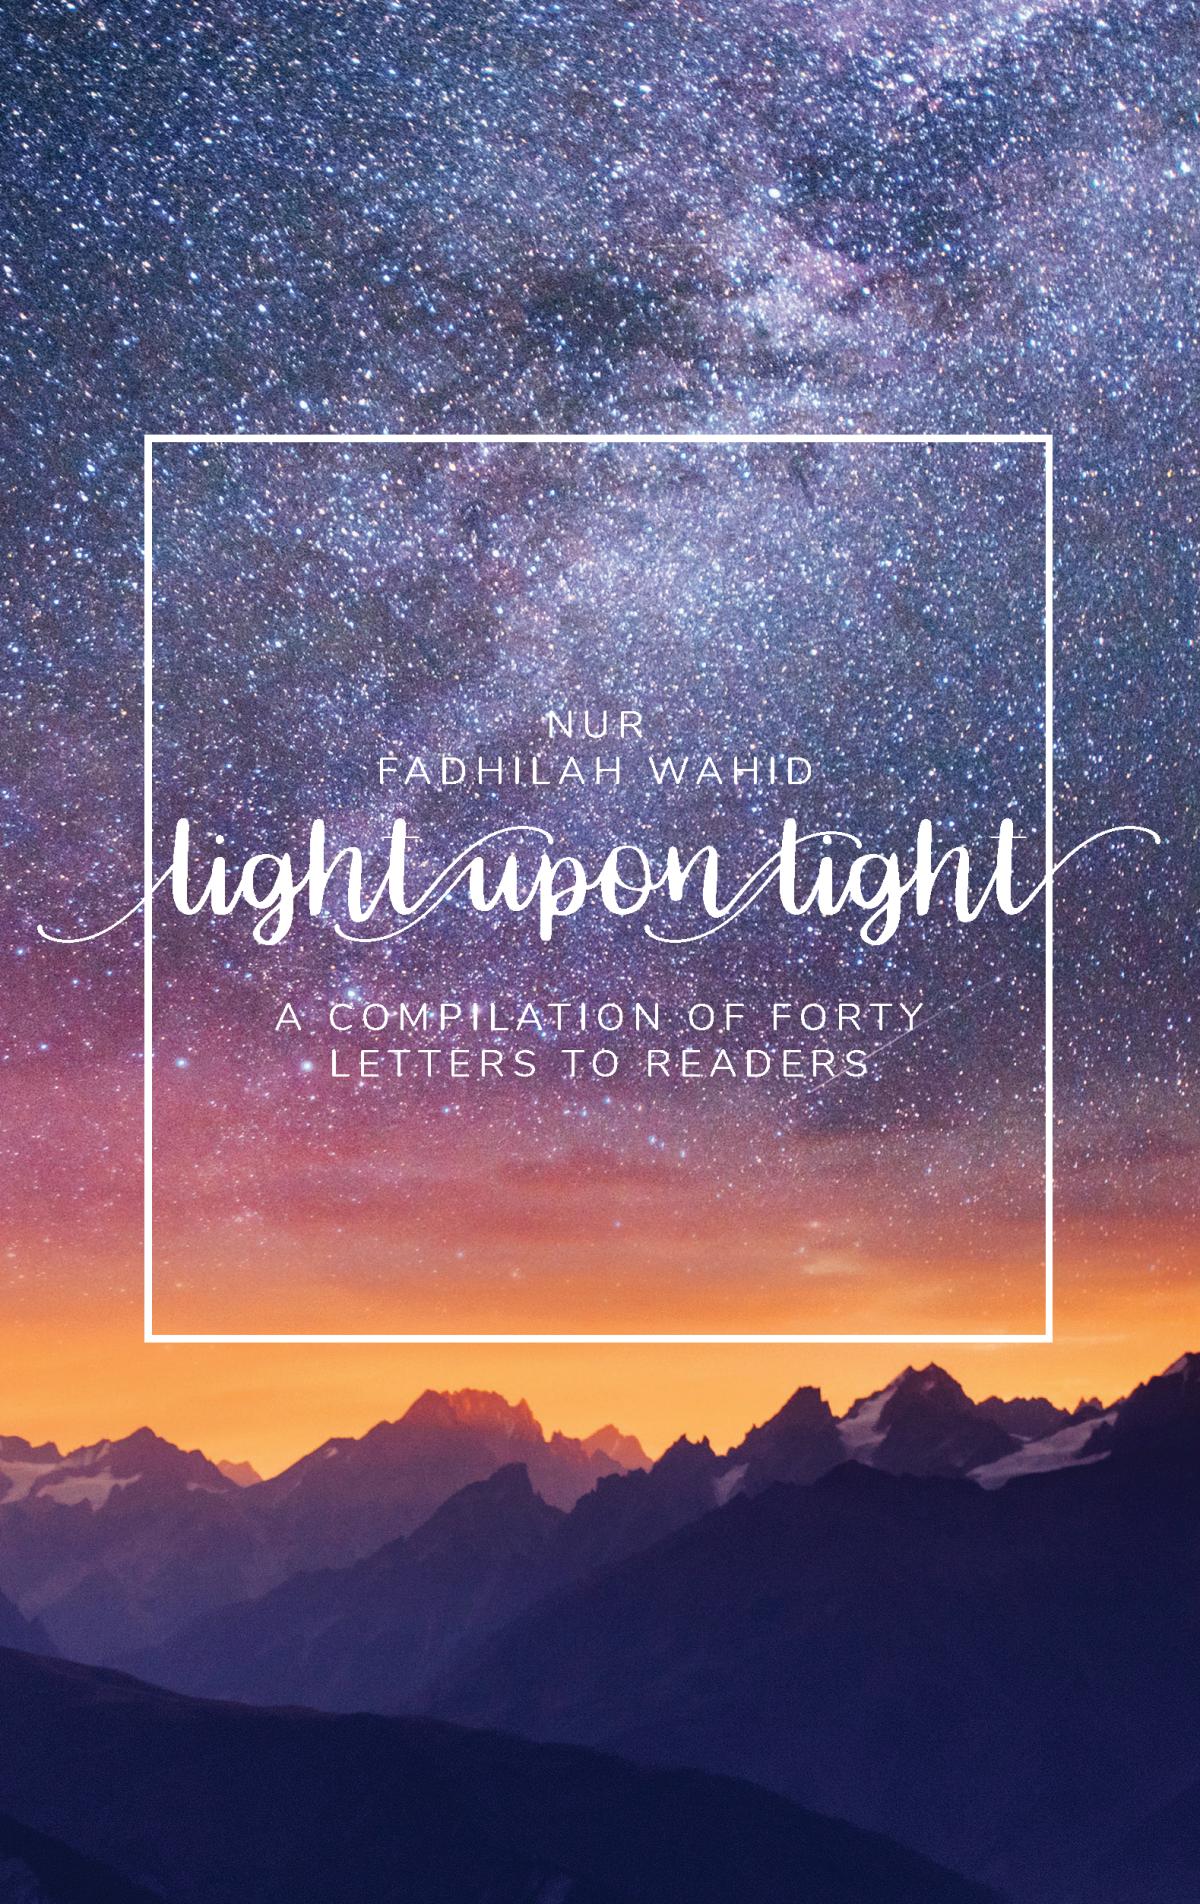 Light Upon Light by Nur Fadhilah Wahid